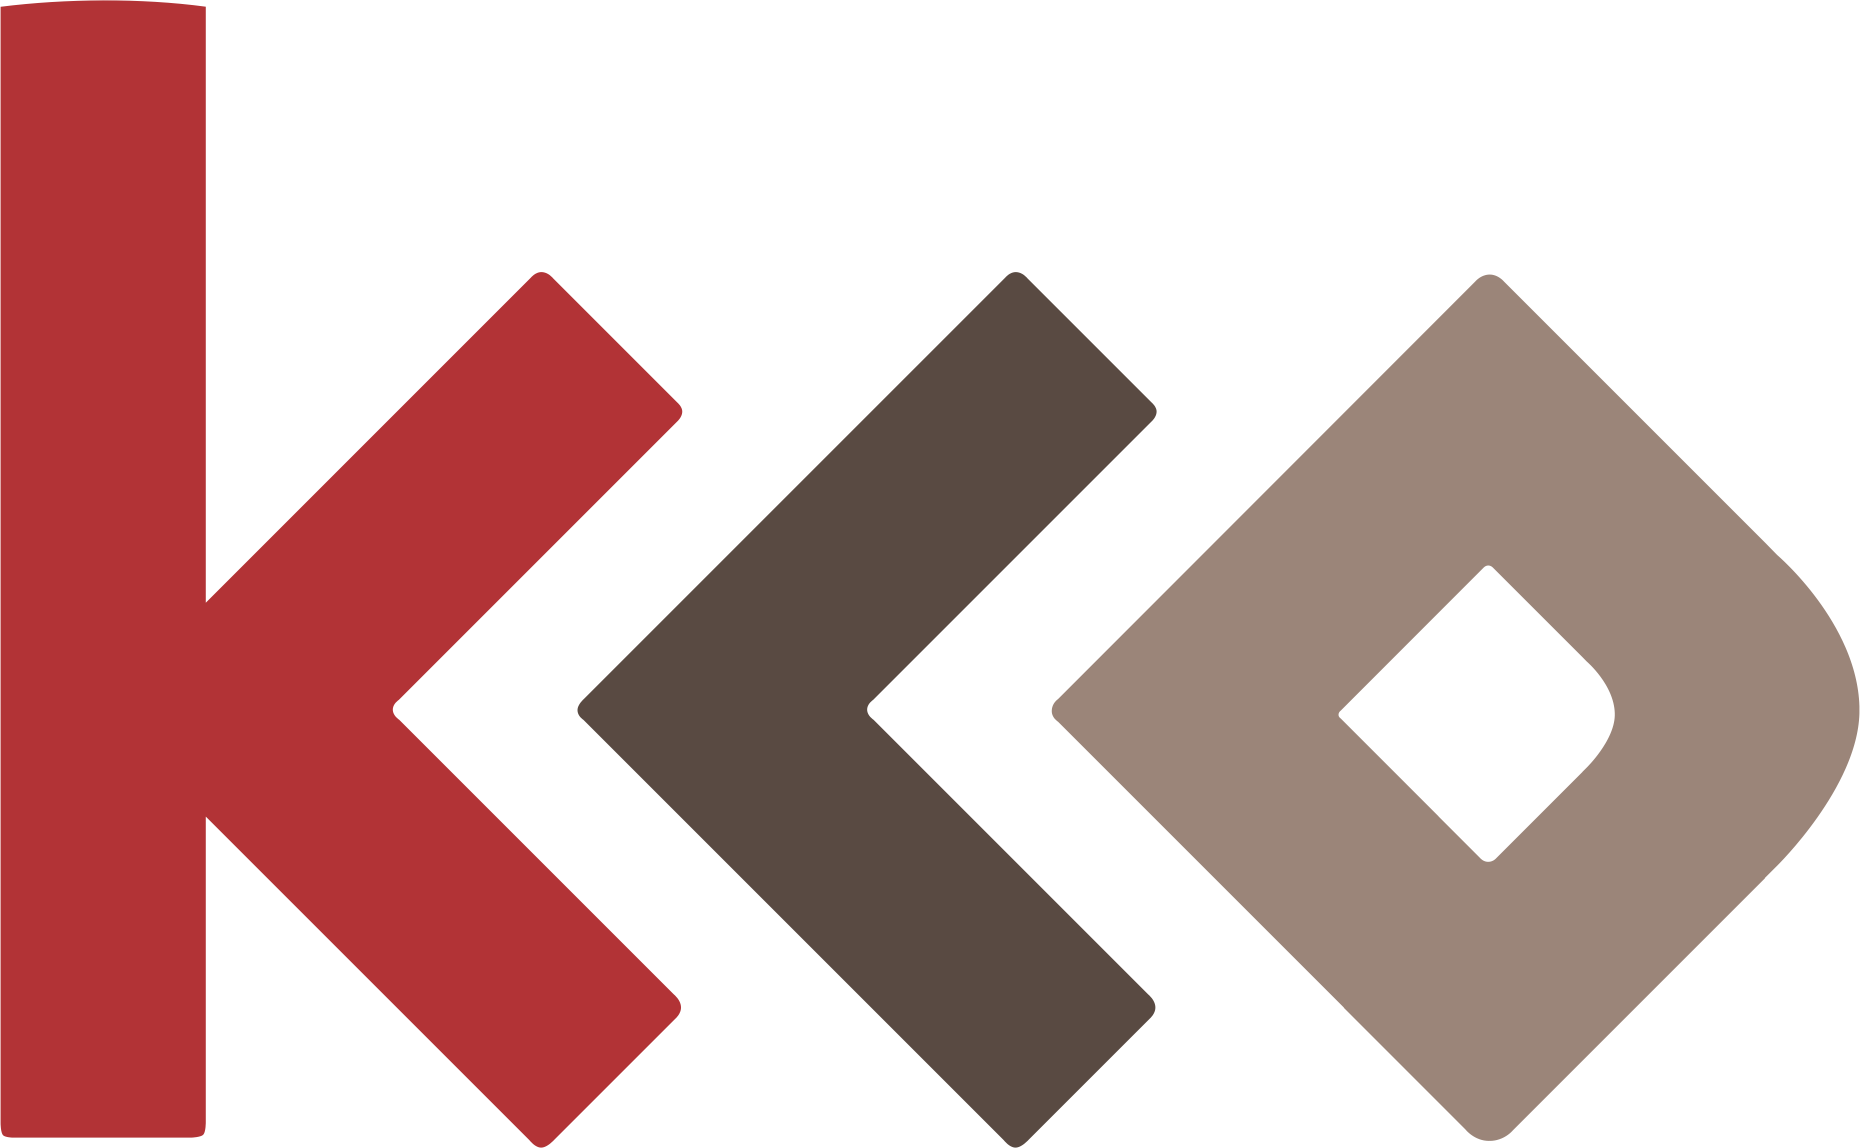 KCO - Sve za izradu PVC, AL i drvene stolarije